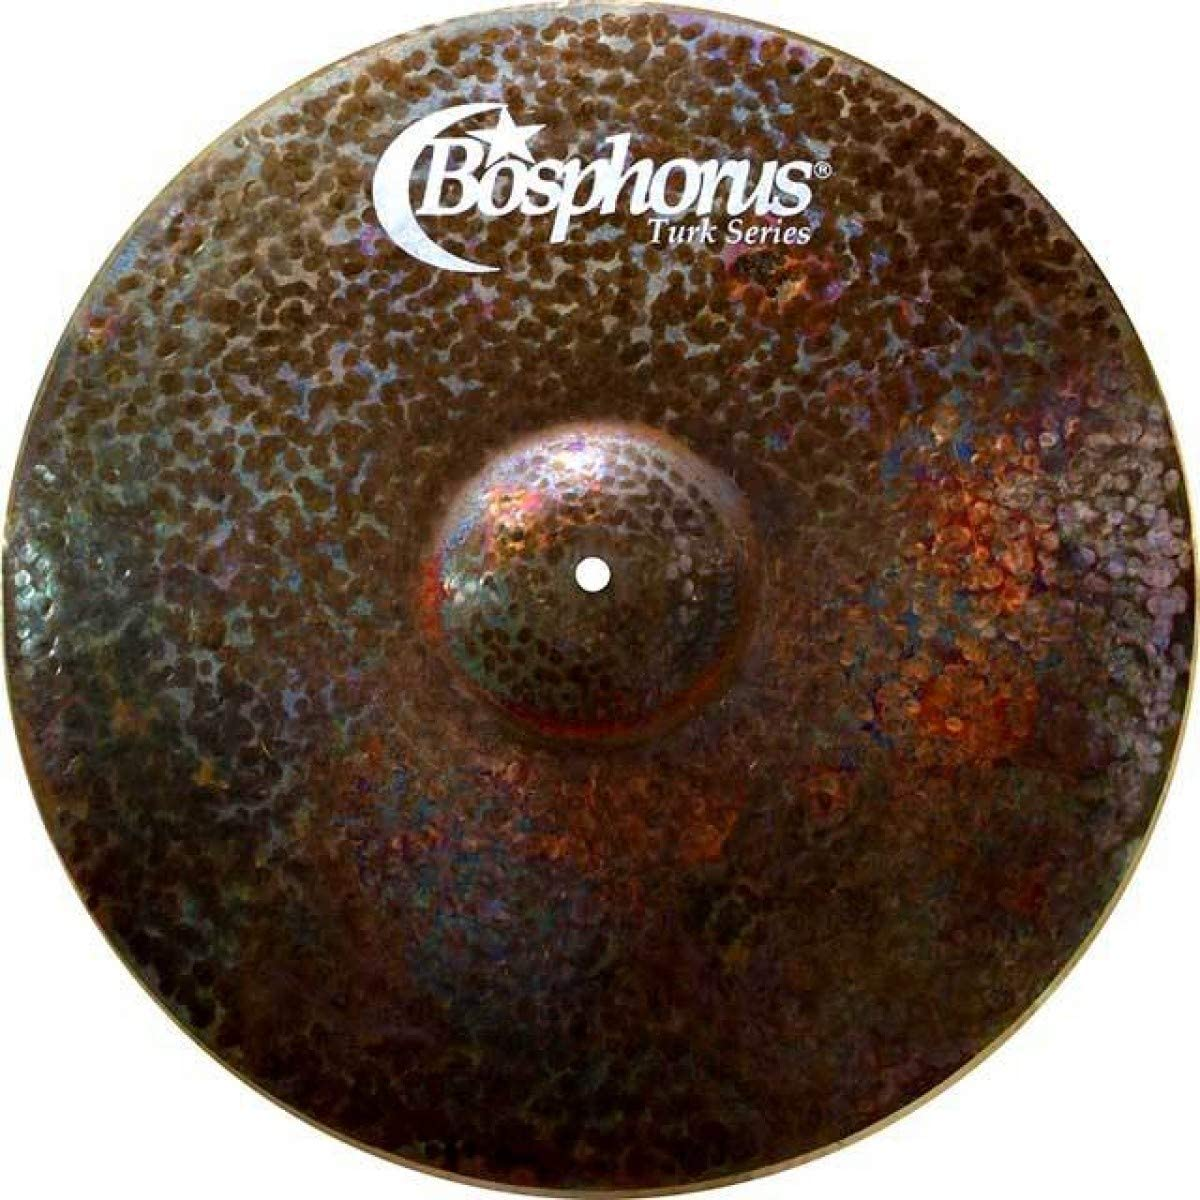 Bosphorus Cymbals K12S 12-Inch Turk Series Splash Cymbal